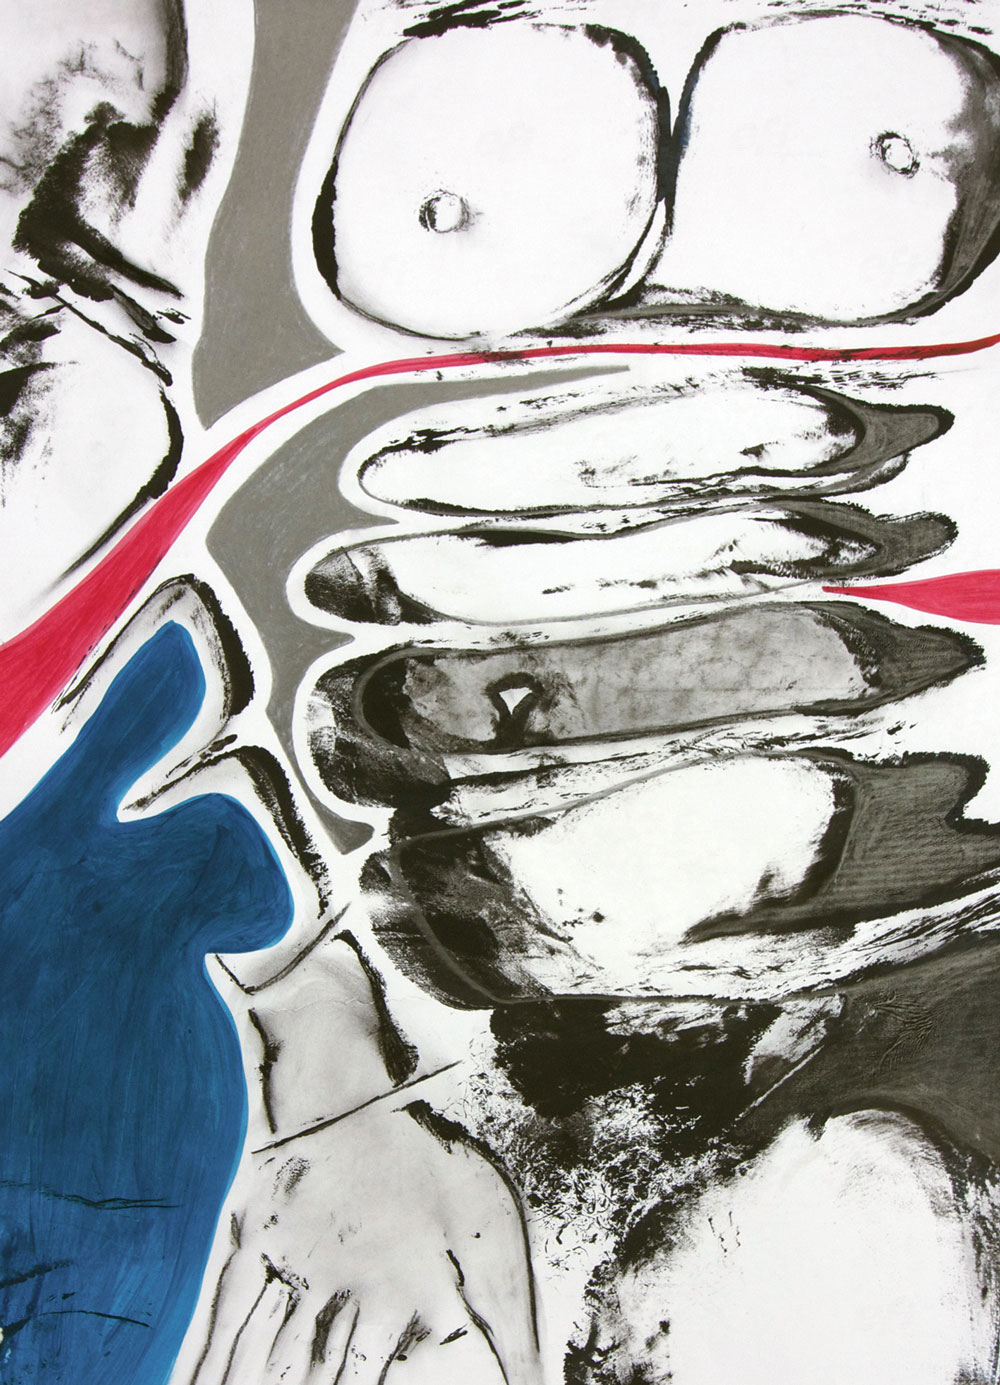 Fragmente 2016 / Gouache, Kohle, Graphit auf Papier / 60x80